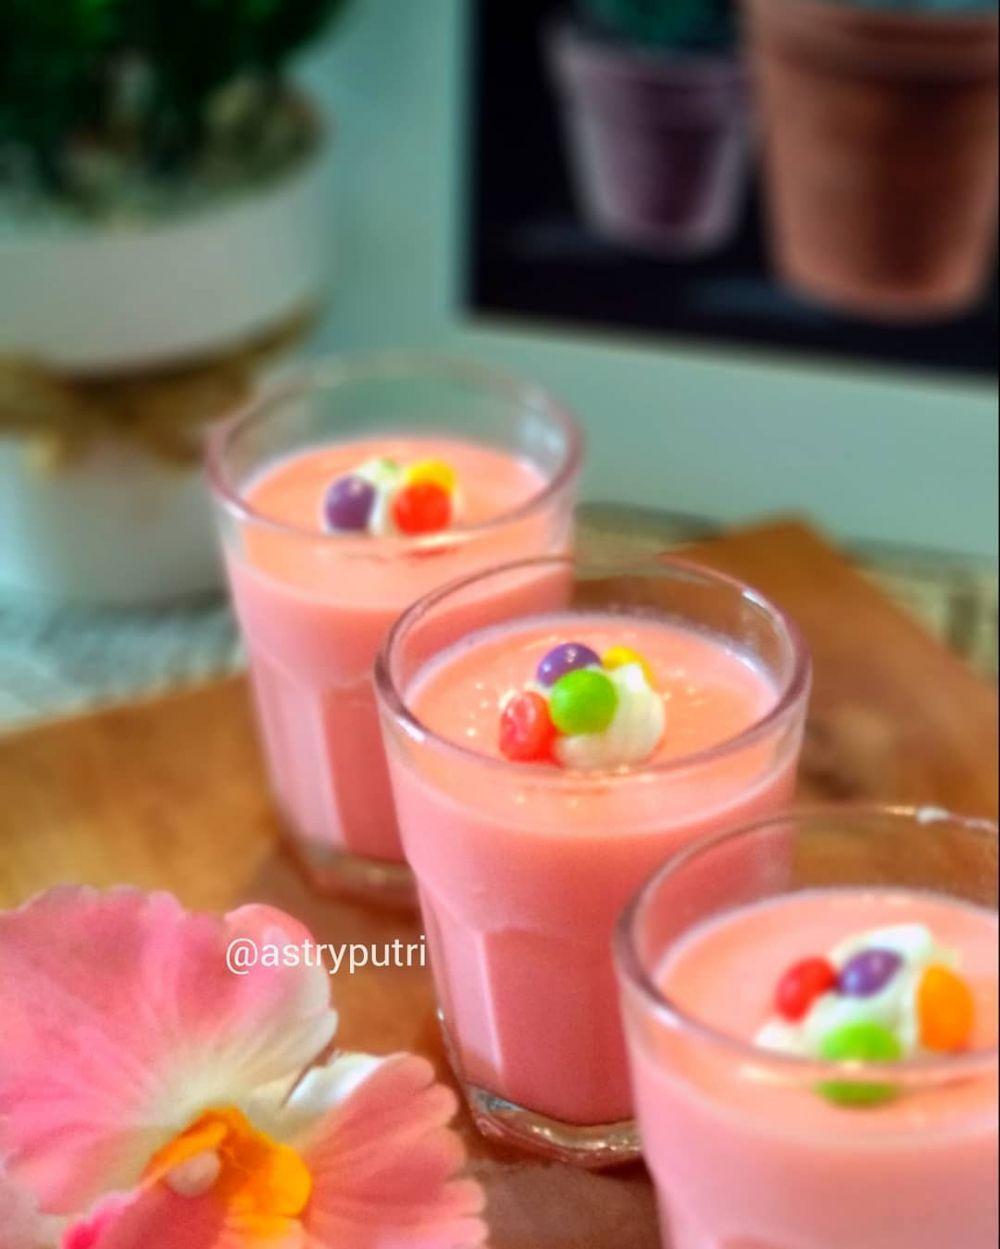 Resep Silky Puding C 2020 Brilio Net Pudding Desserts Puding Hidangan Penutup